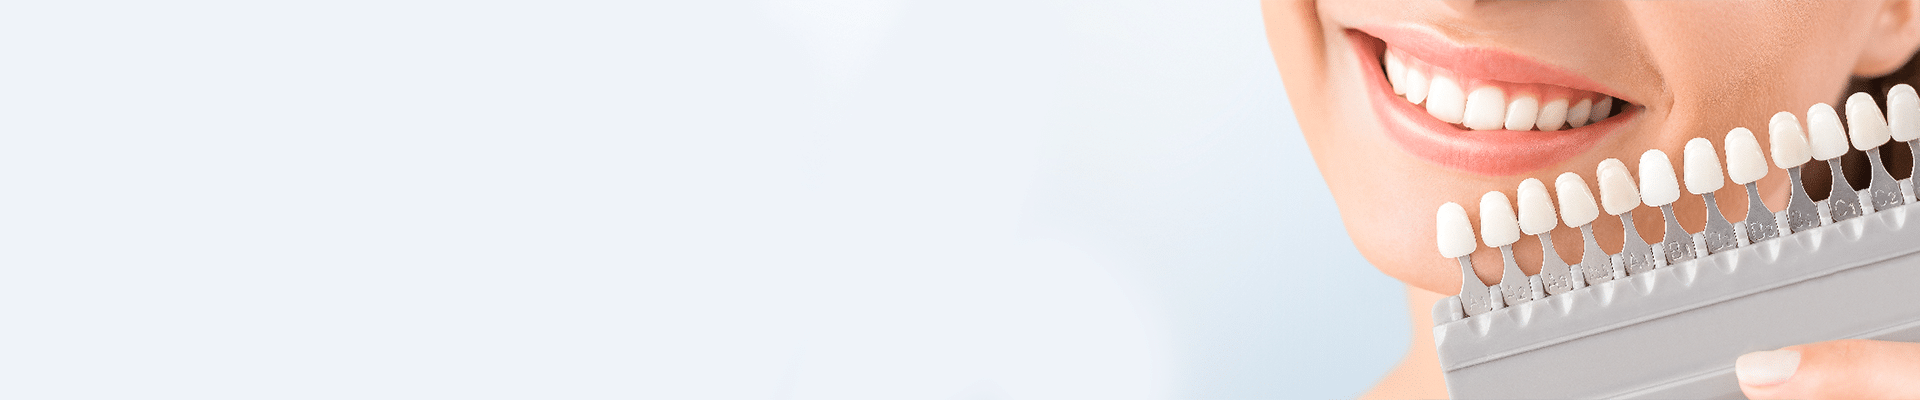 [:fr]Facette dentaire Nabeul : dents blanches et alignées prix pas cher[:ar]تغليف الأسنان نابل : أسنان بيضاء ومرصفة رخيصة الثمن[:]